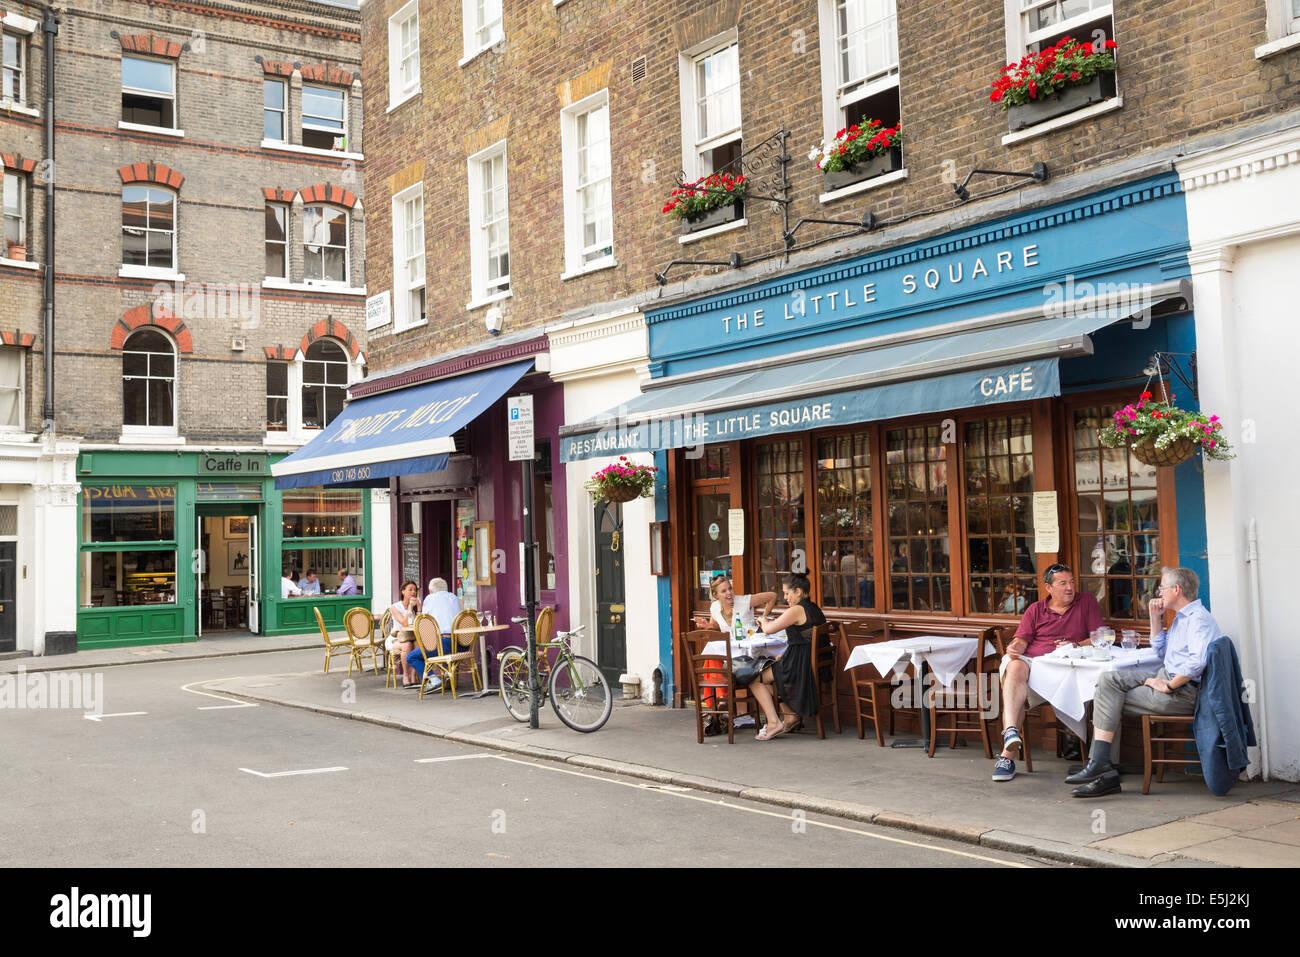 Small restaurants in Shepherd Market, Mayfair, London, England, UK - Stock Image